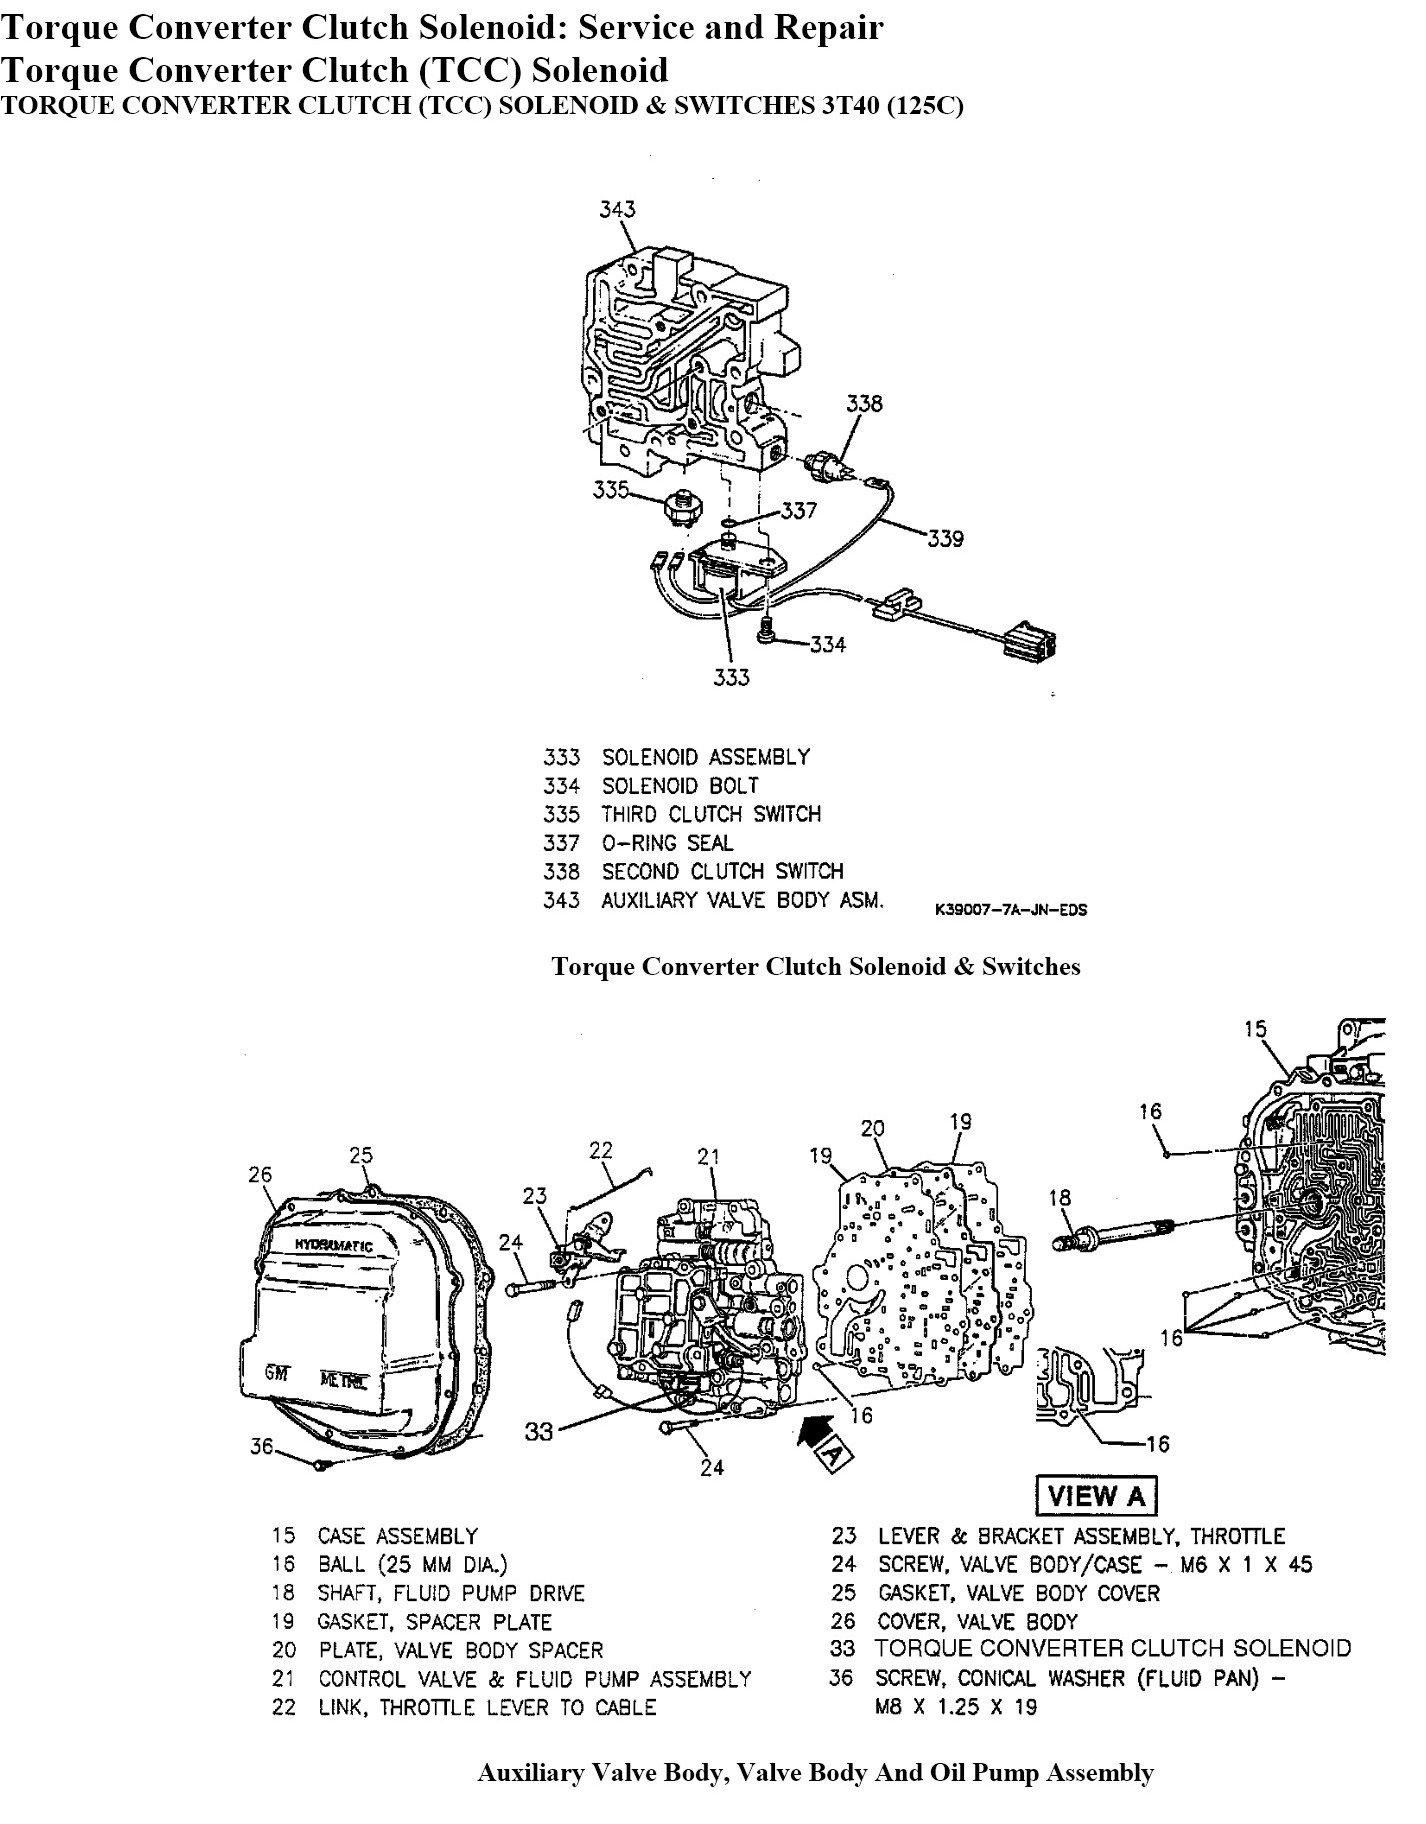 49ai6 Pontiac Grandprix P1811 Code 04 Pontiac Grandprix likewise Crank Sensor Location 68932 likewise 2000 Ranger Thermostat Sensor as well 18pxv Replace Heater Core 1999 Dodge Dakota V6 furthermore 376ol 1996 Grand Need Know Heater. on pontiac grand am 2001 no start